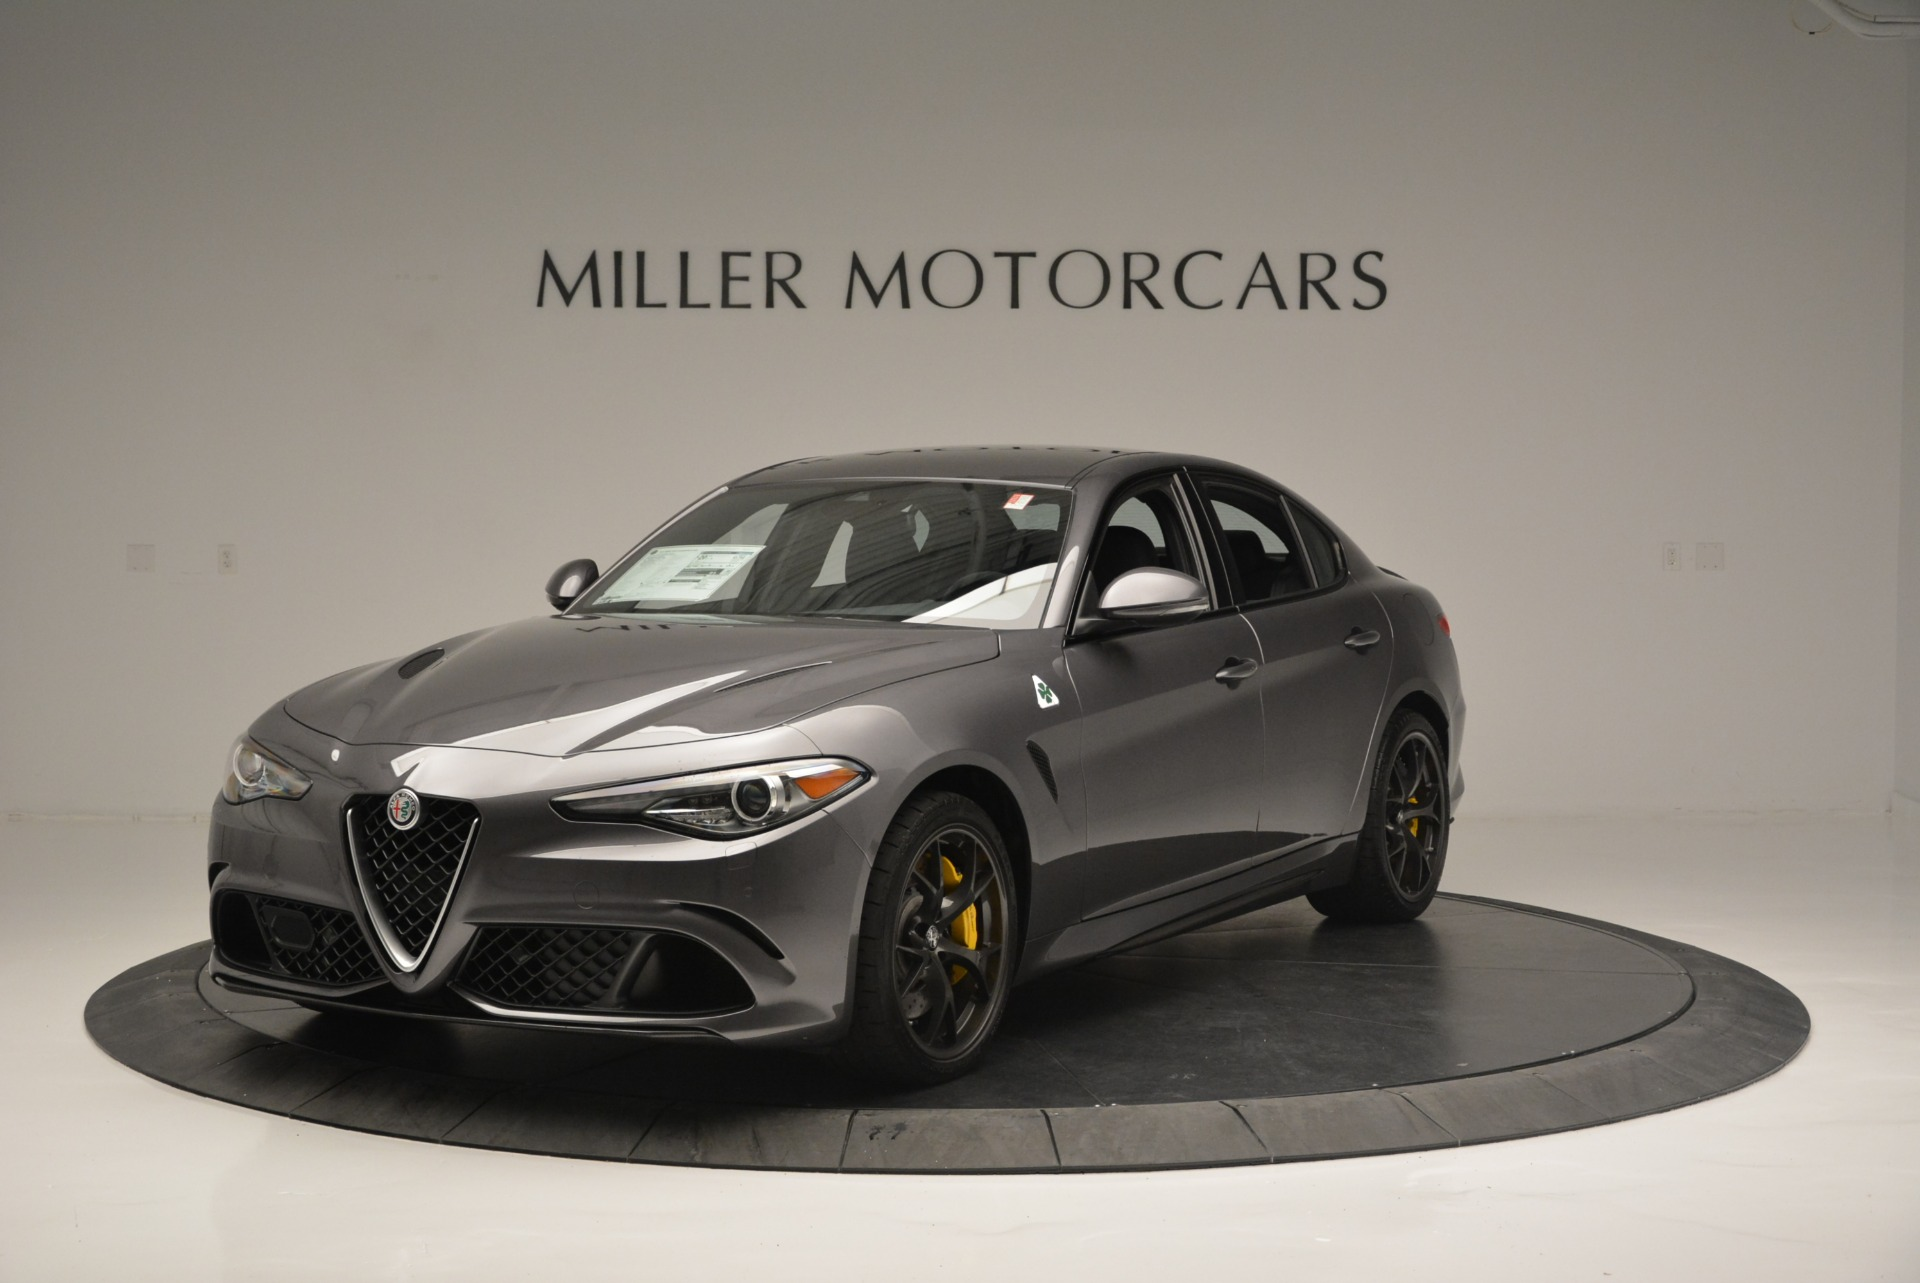 Alfa Romeo Giulia Quadrifoglio Stock LW For Sale Near - Www alfa romeo